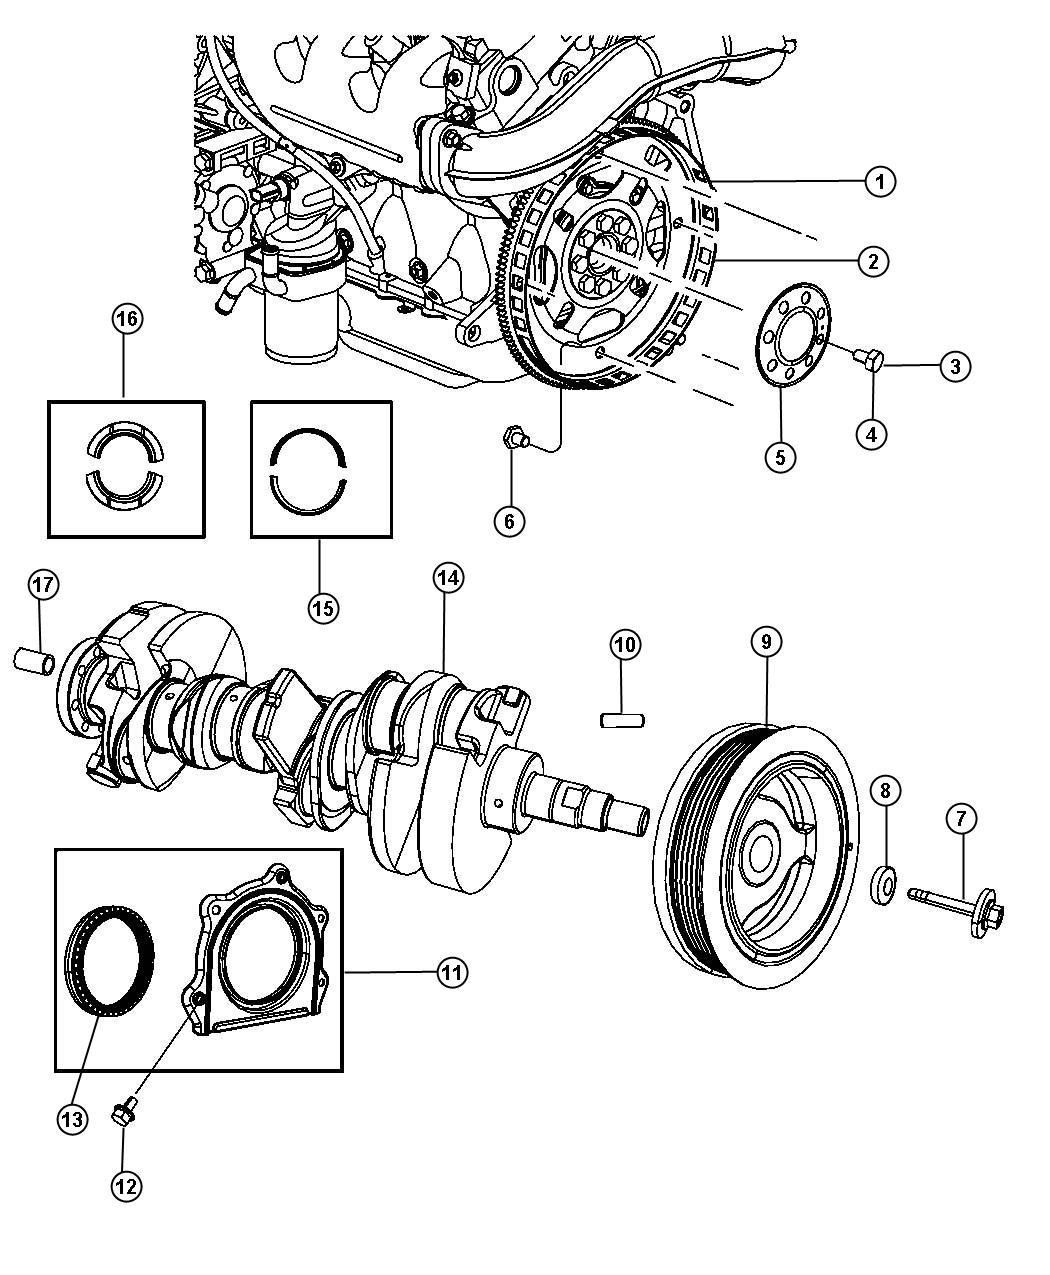 Jeep Wrangler Flywheel. Engine. Manual transmission